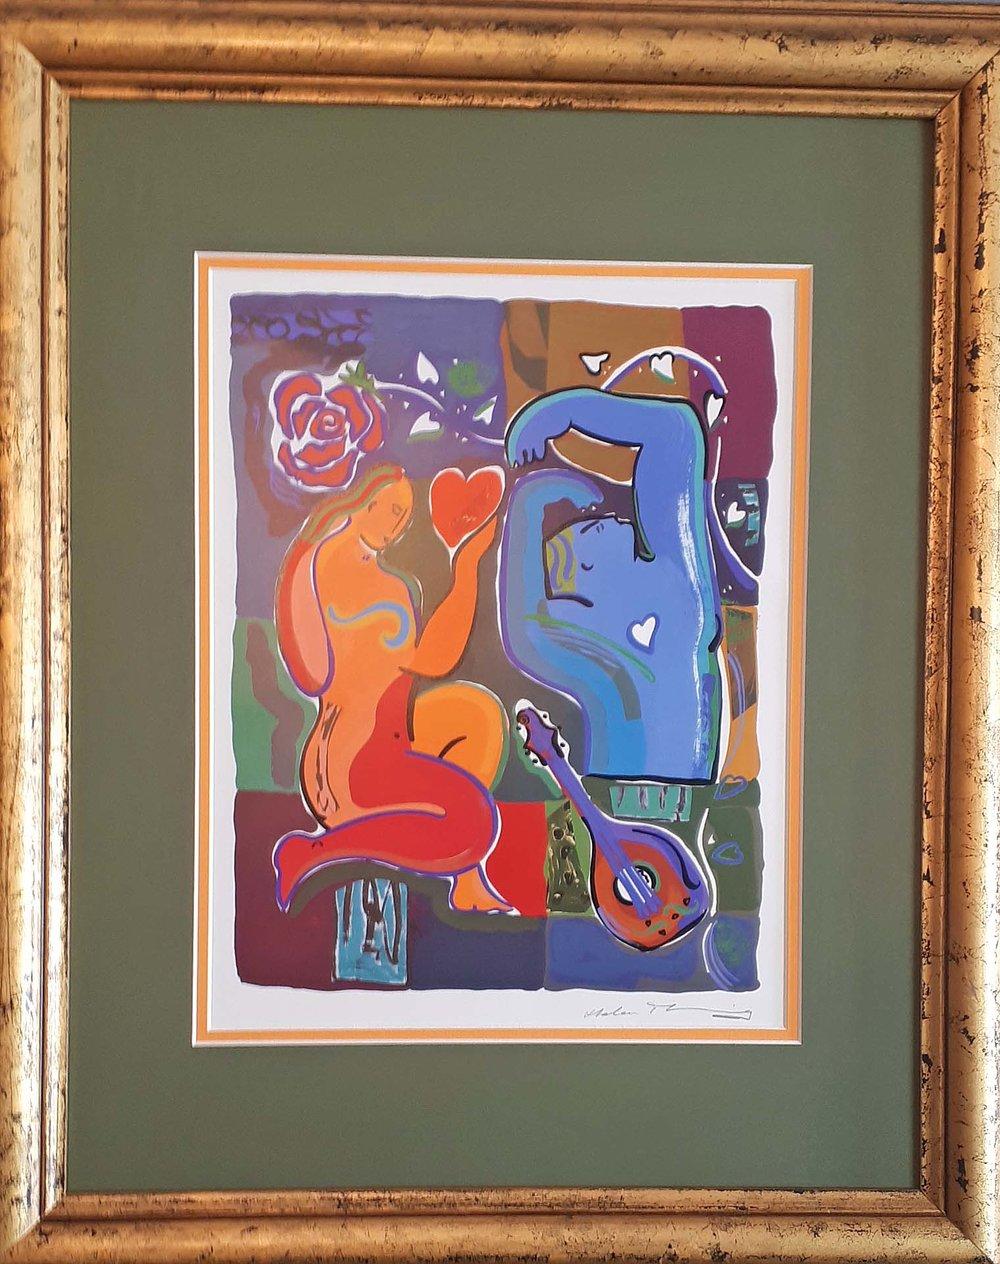 "Helen Manning, U.K., Print 1992, ""Music of Love"", Size: 20 x 25, Price: 175.00"